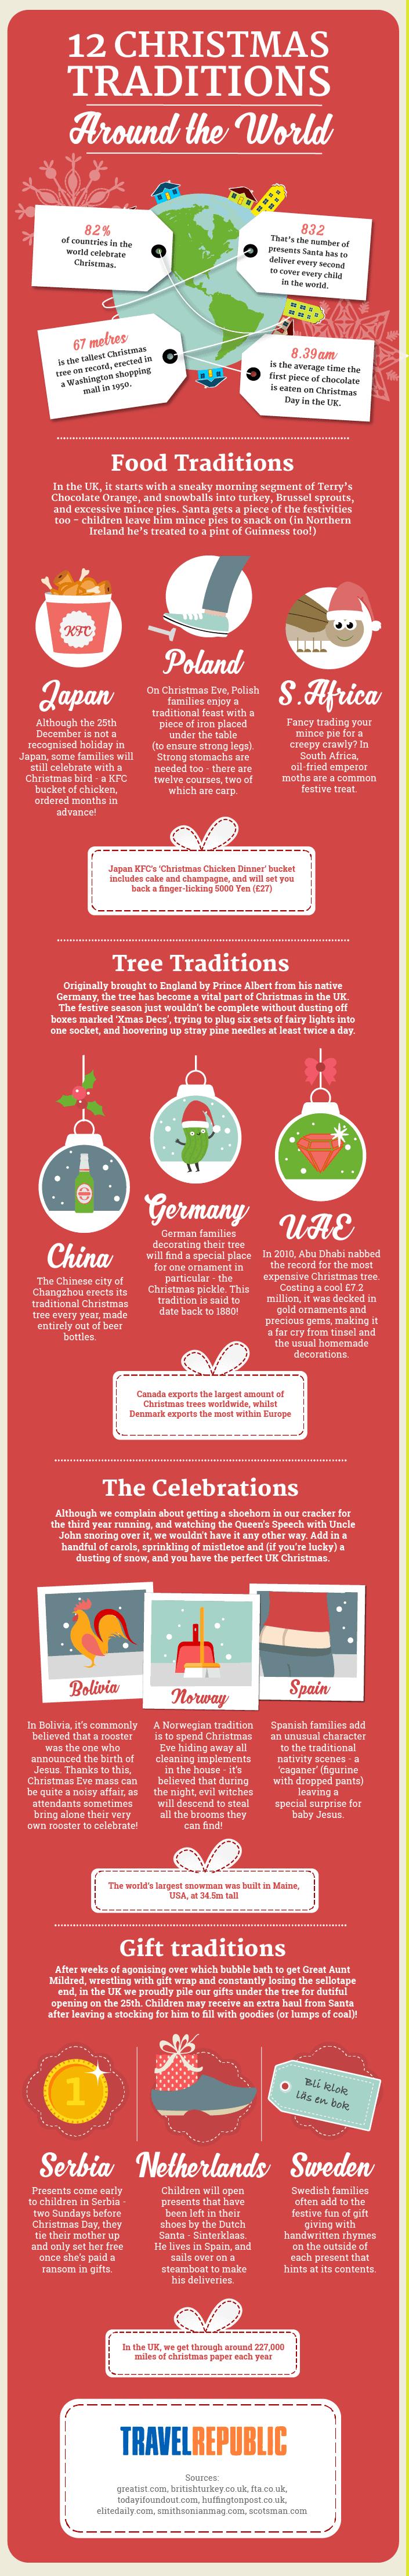 Christmas Traditions Around The World.Christmas Traditions Around The World Daily Infographic